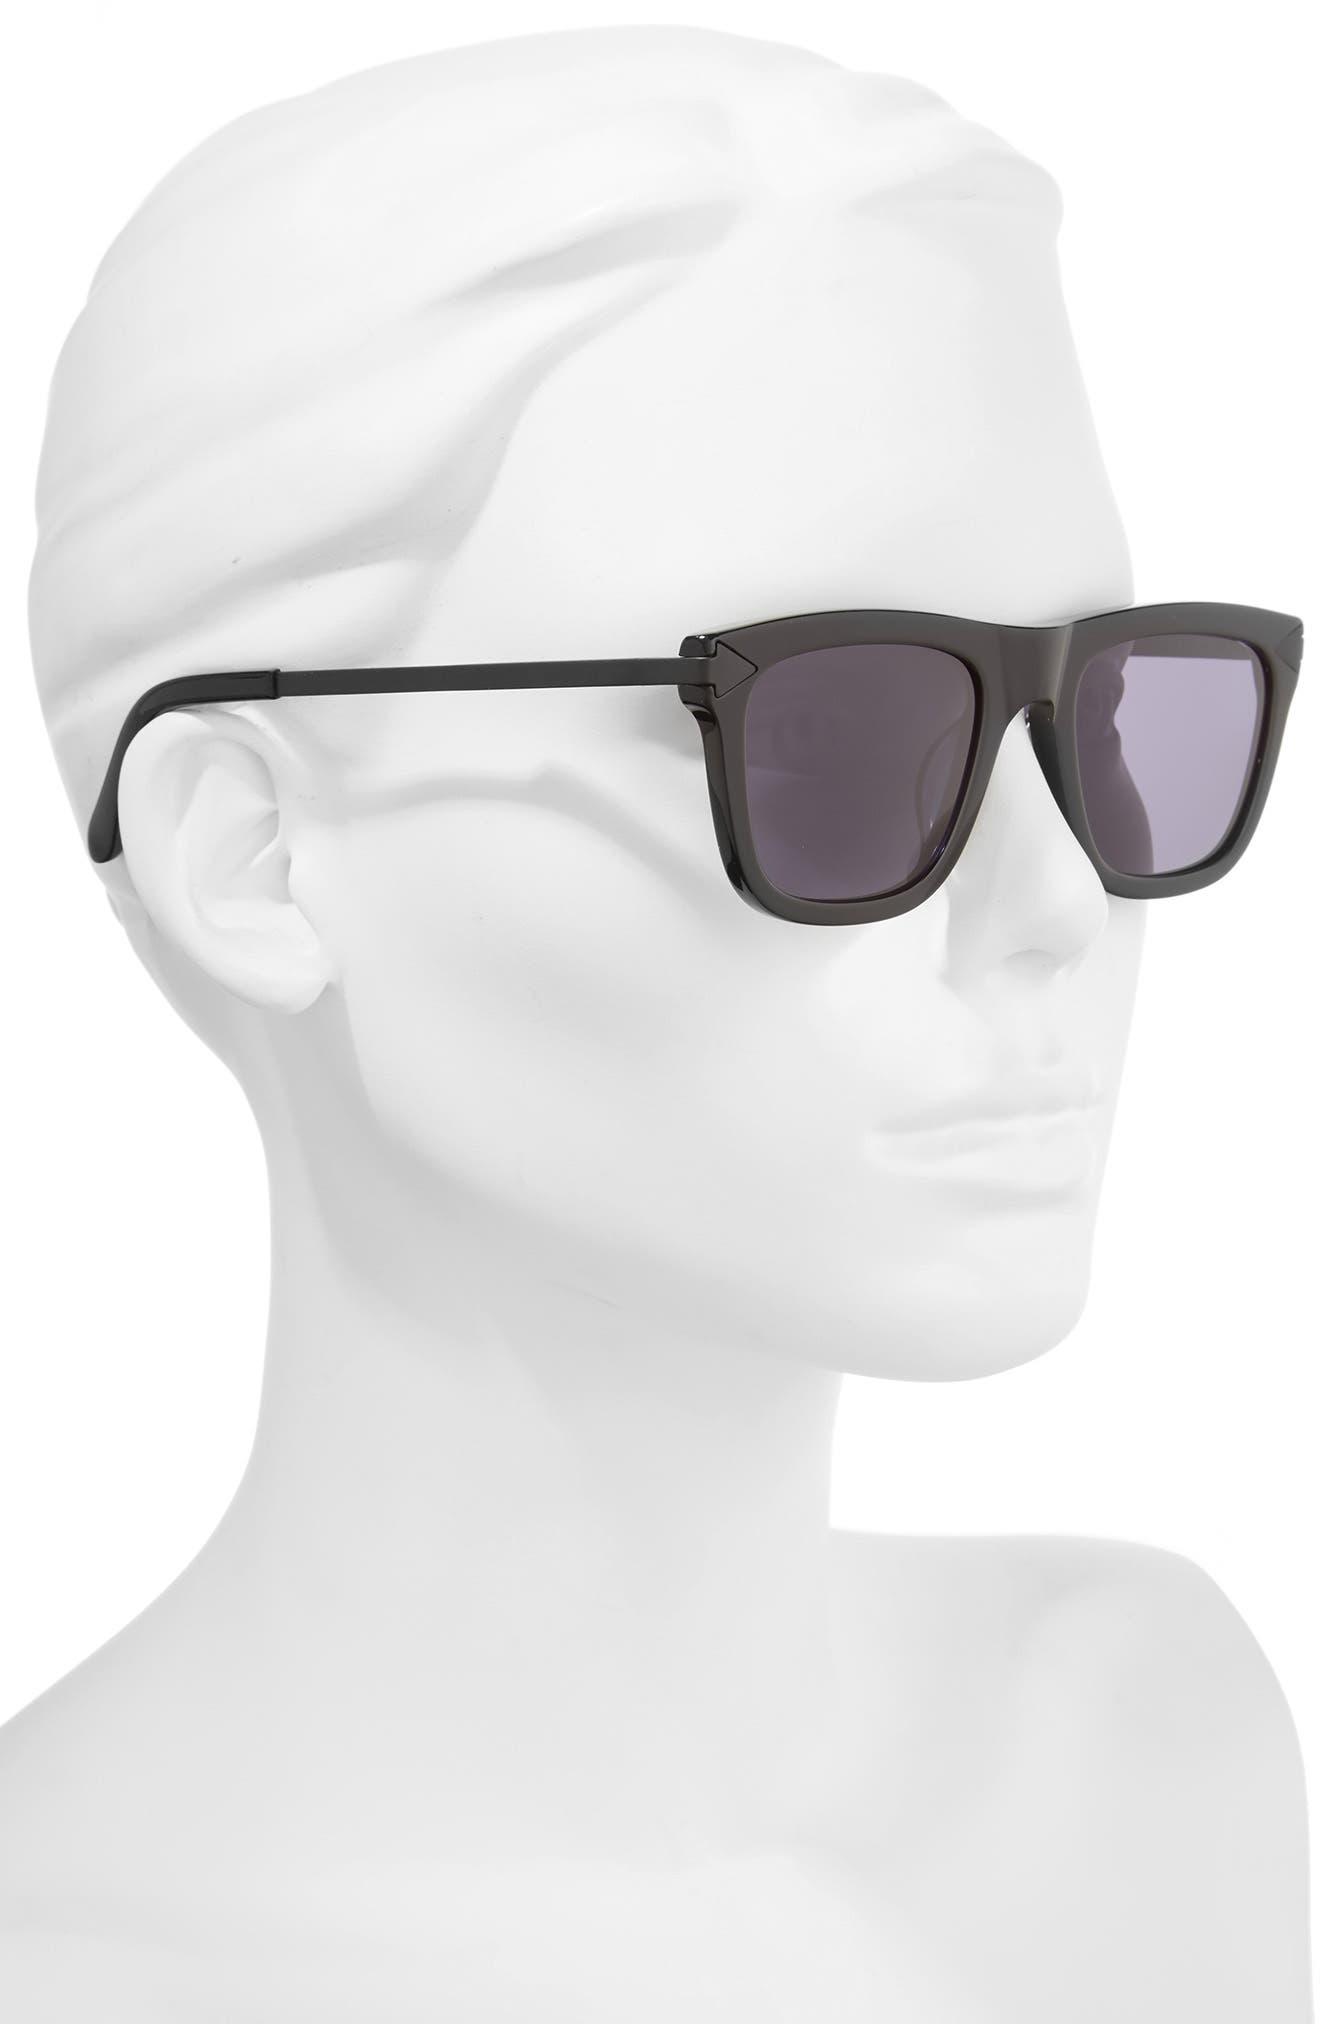 x Monumental Voltaire 51mm Polarized Sunglasses,                             Alternate thumbnail 2, color,                             001